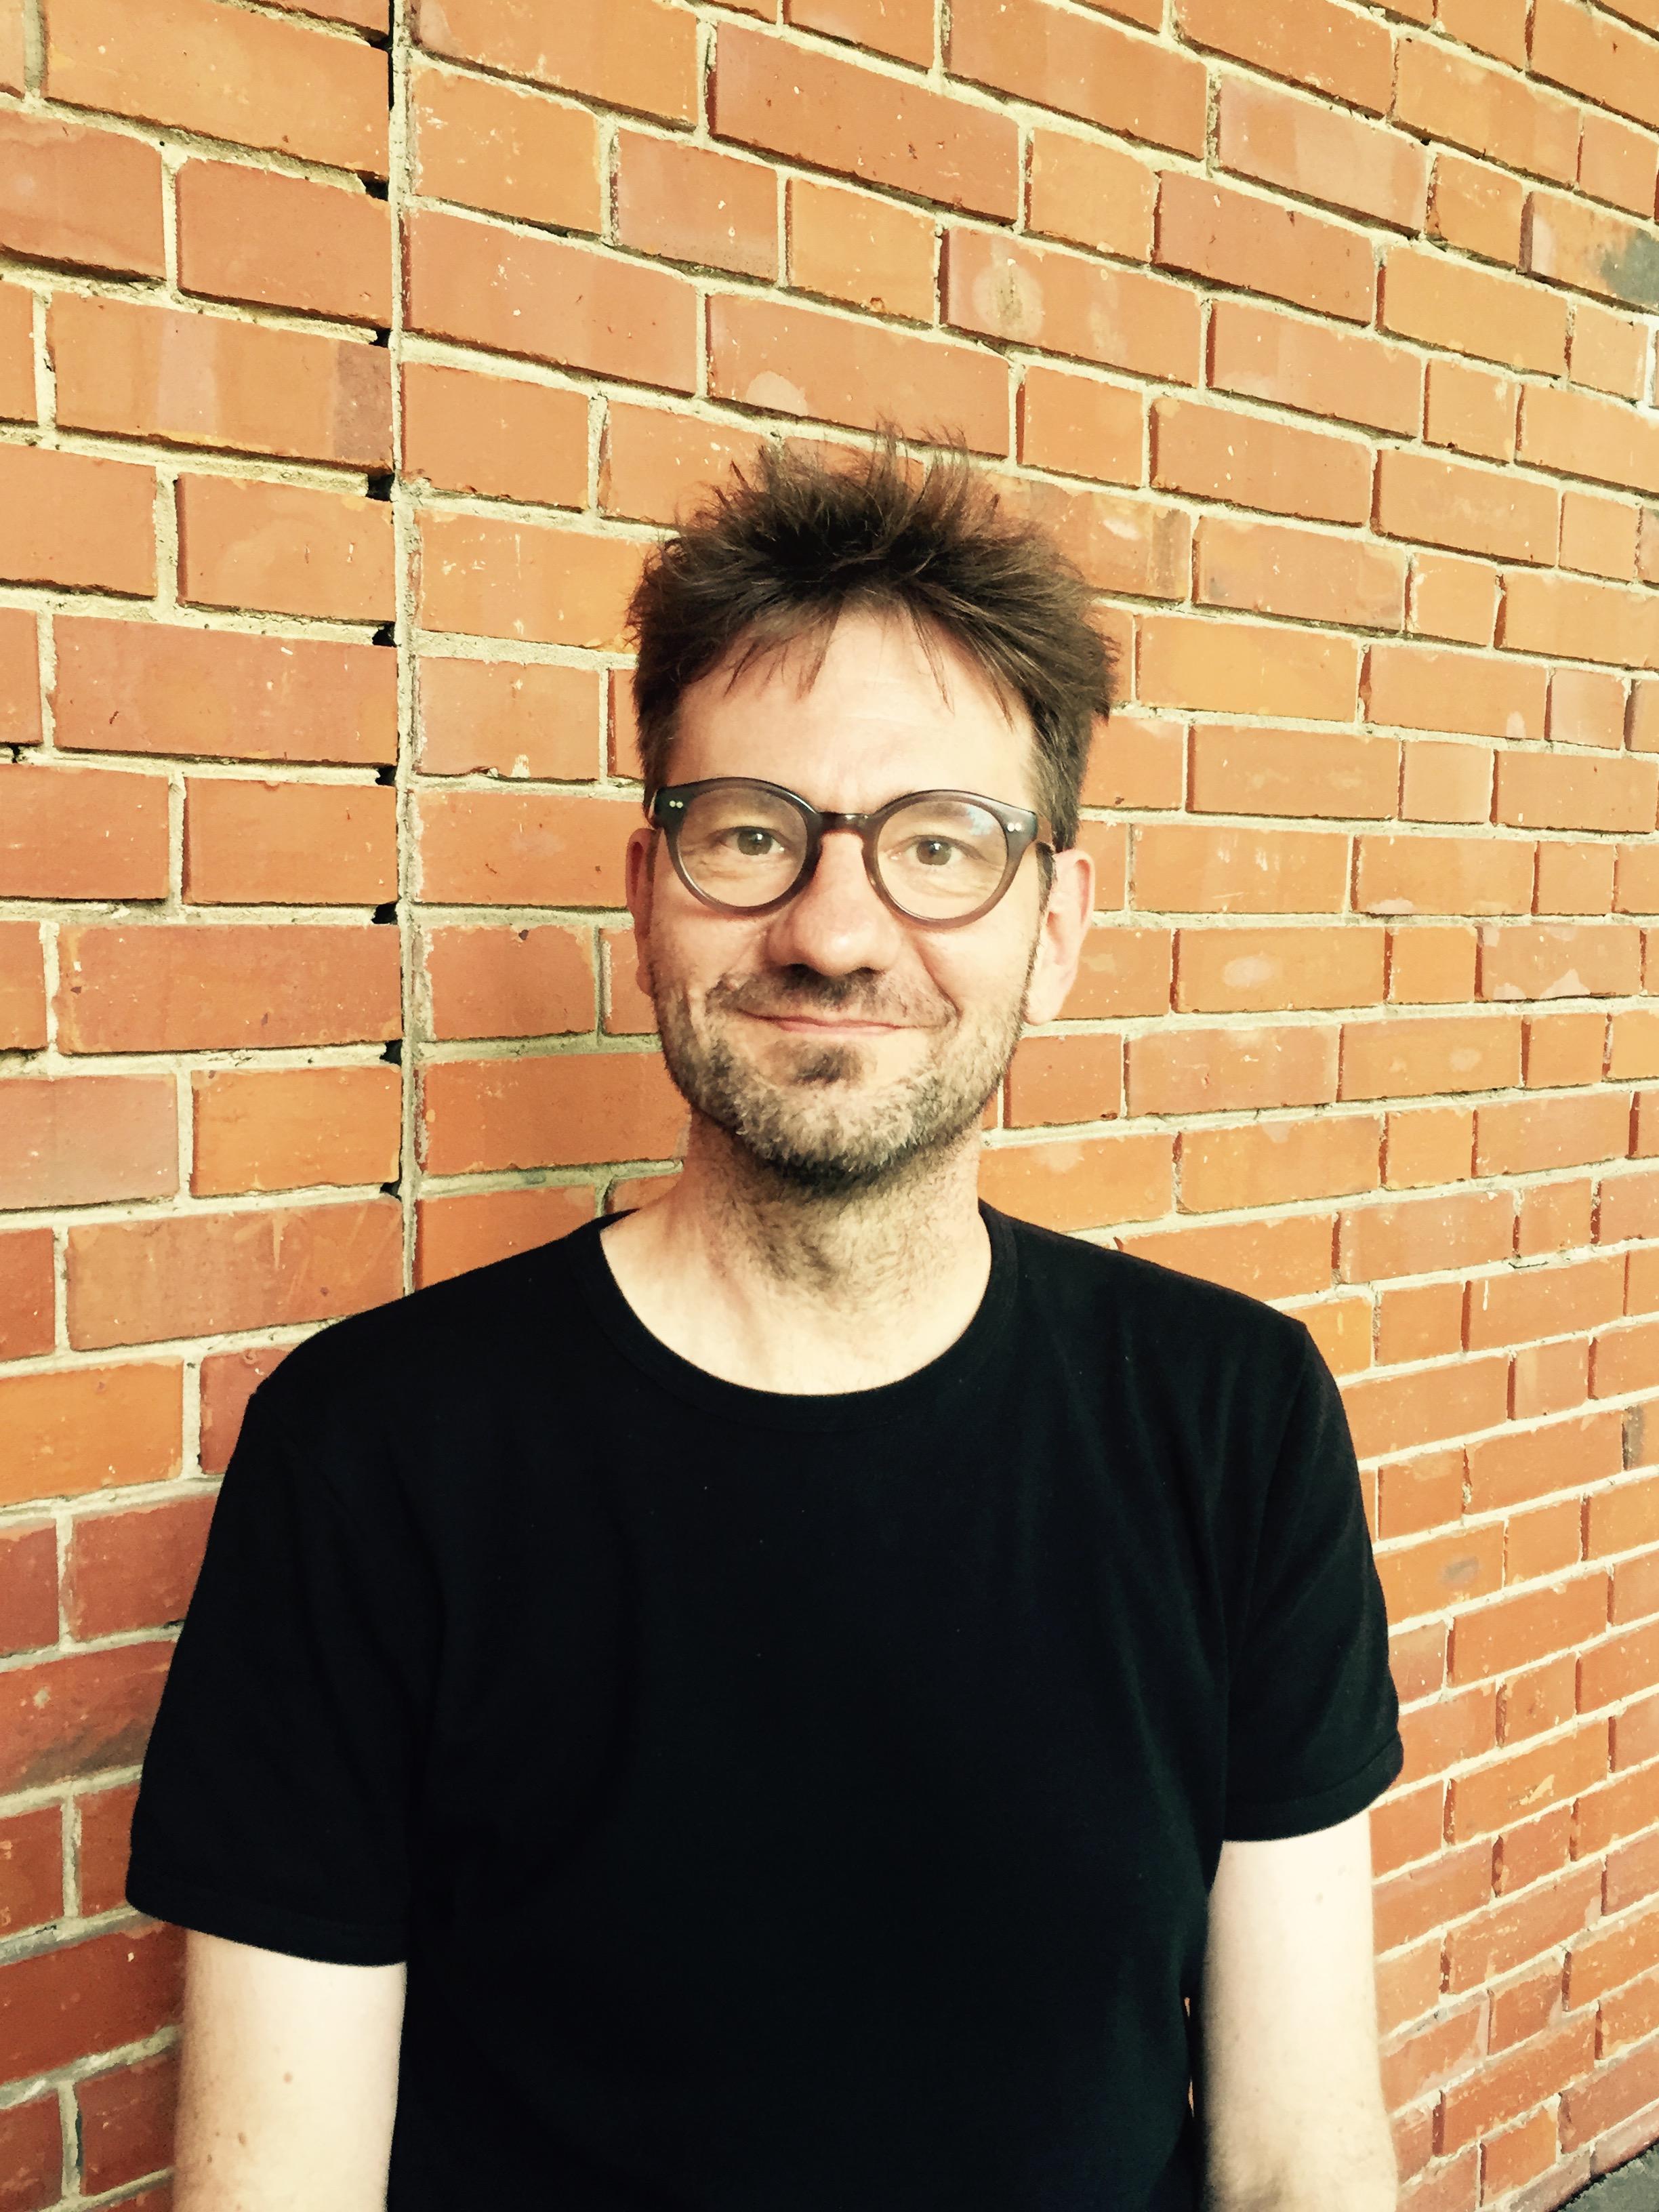 Christian Neuert, Head of Science Centre Spectrum, Deutches Technikmuseumjpg.jpg